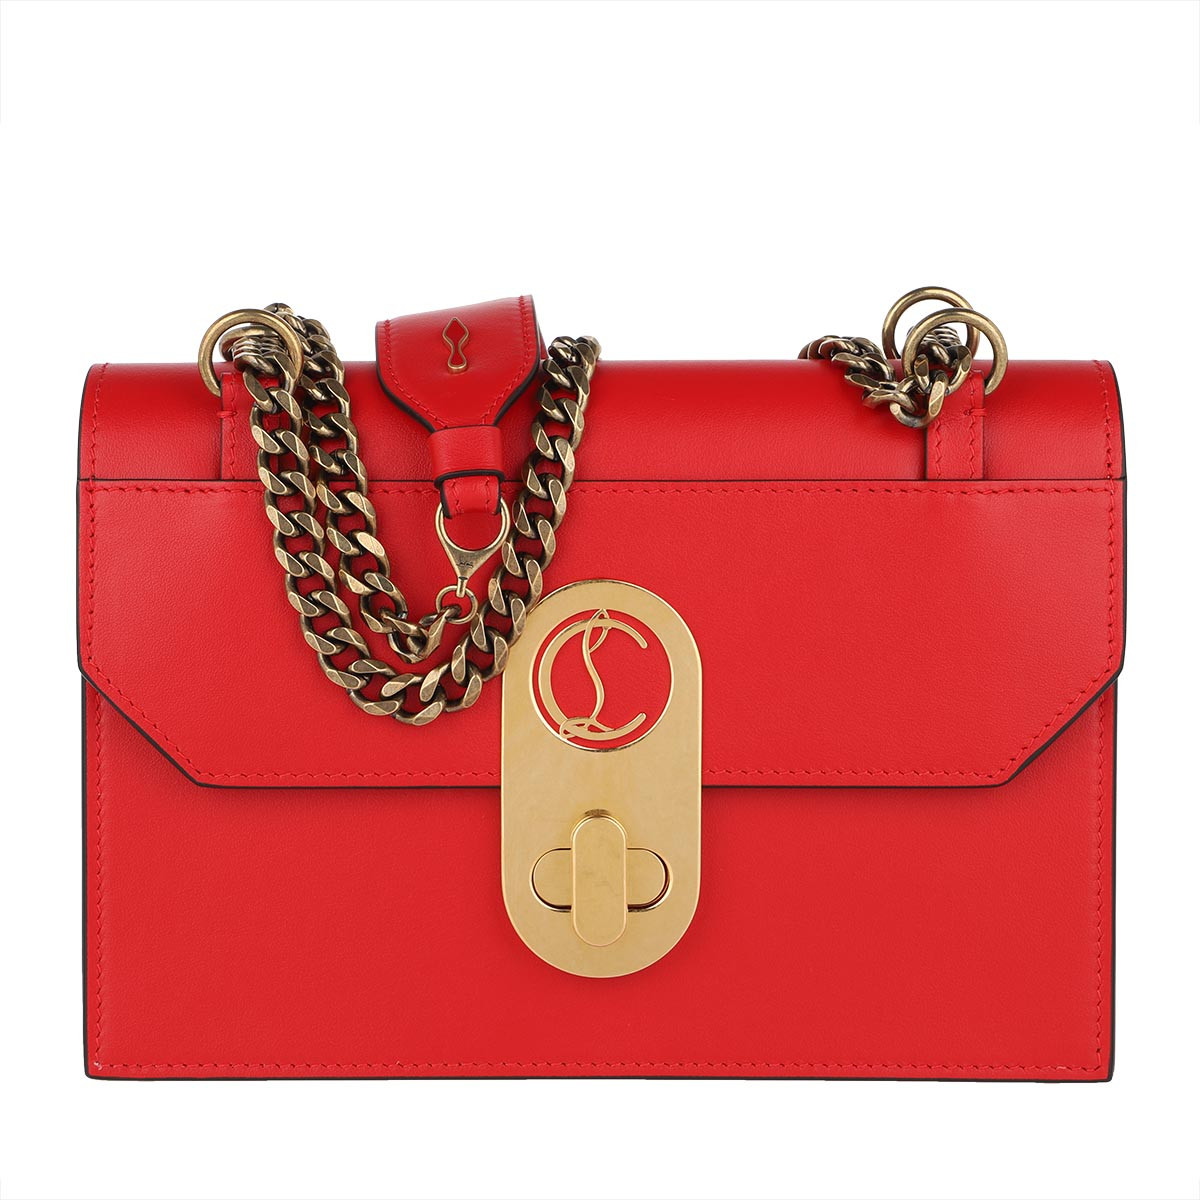 Christian Louboutin Umhängetasche - Elisa Crossbody Bag Leather Fume Loubi - in rot - für Damen